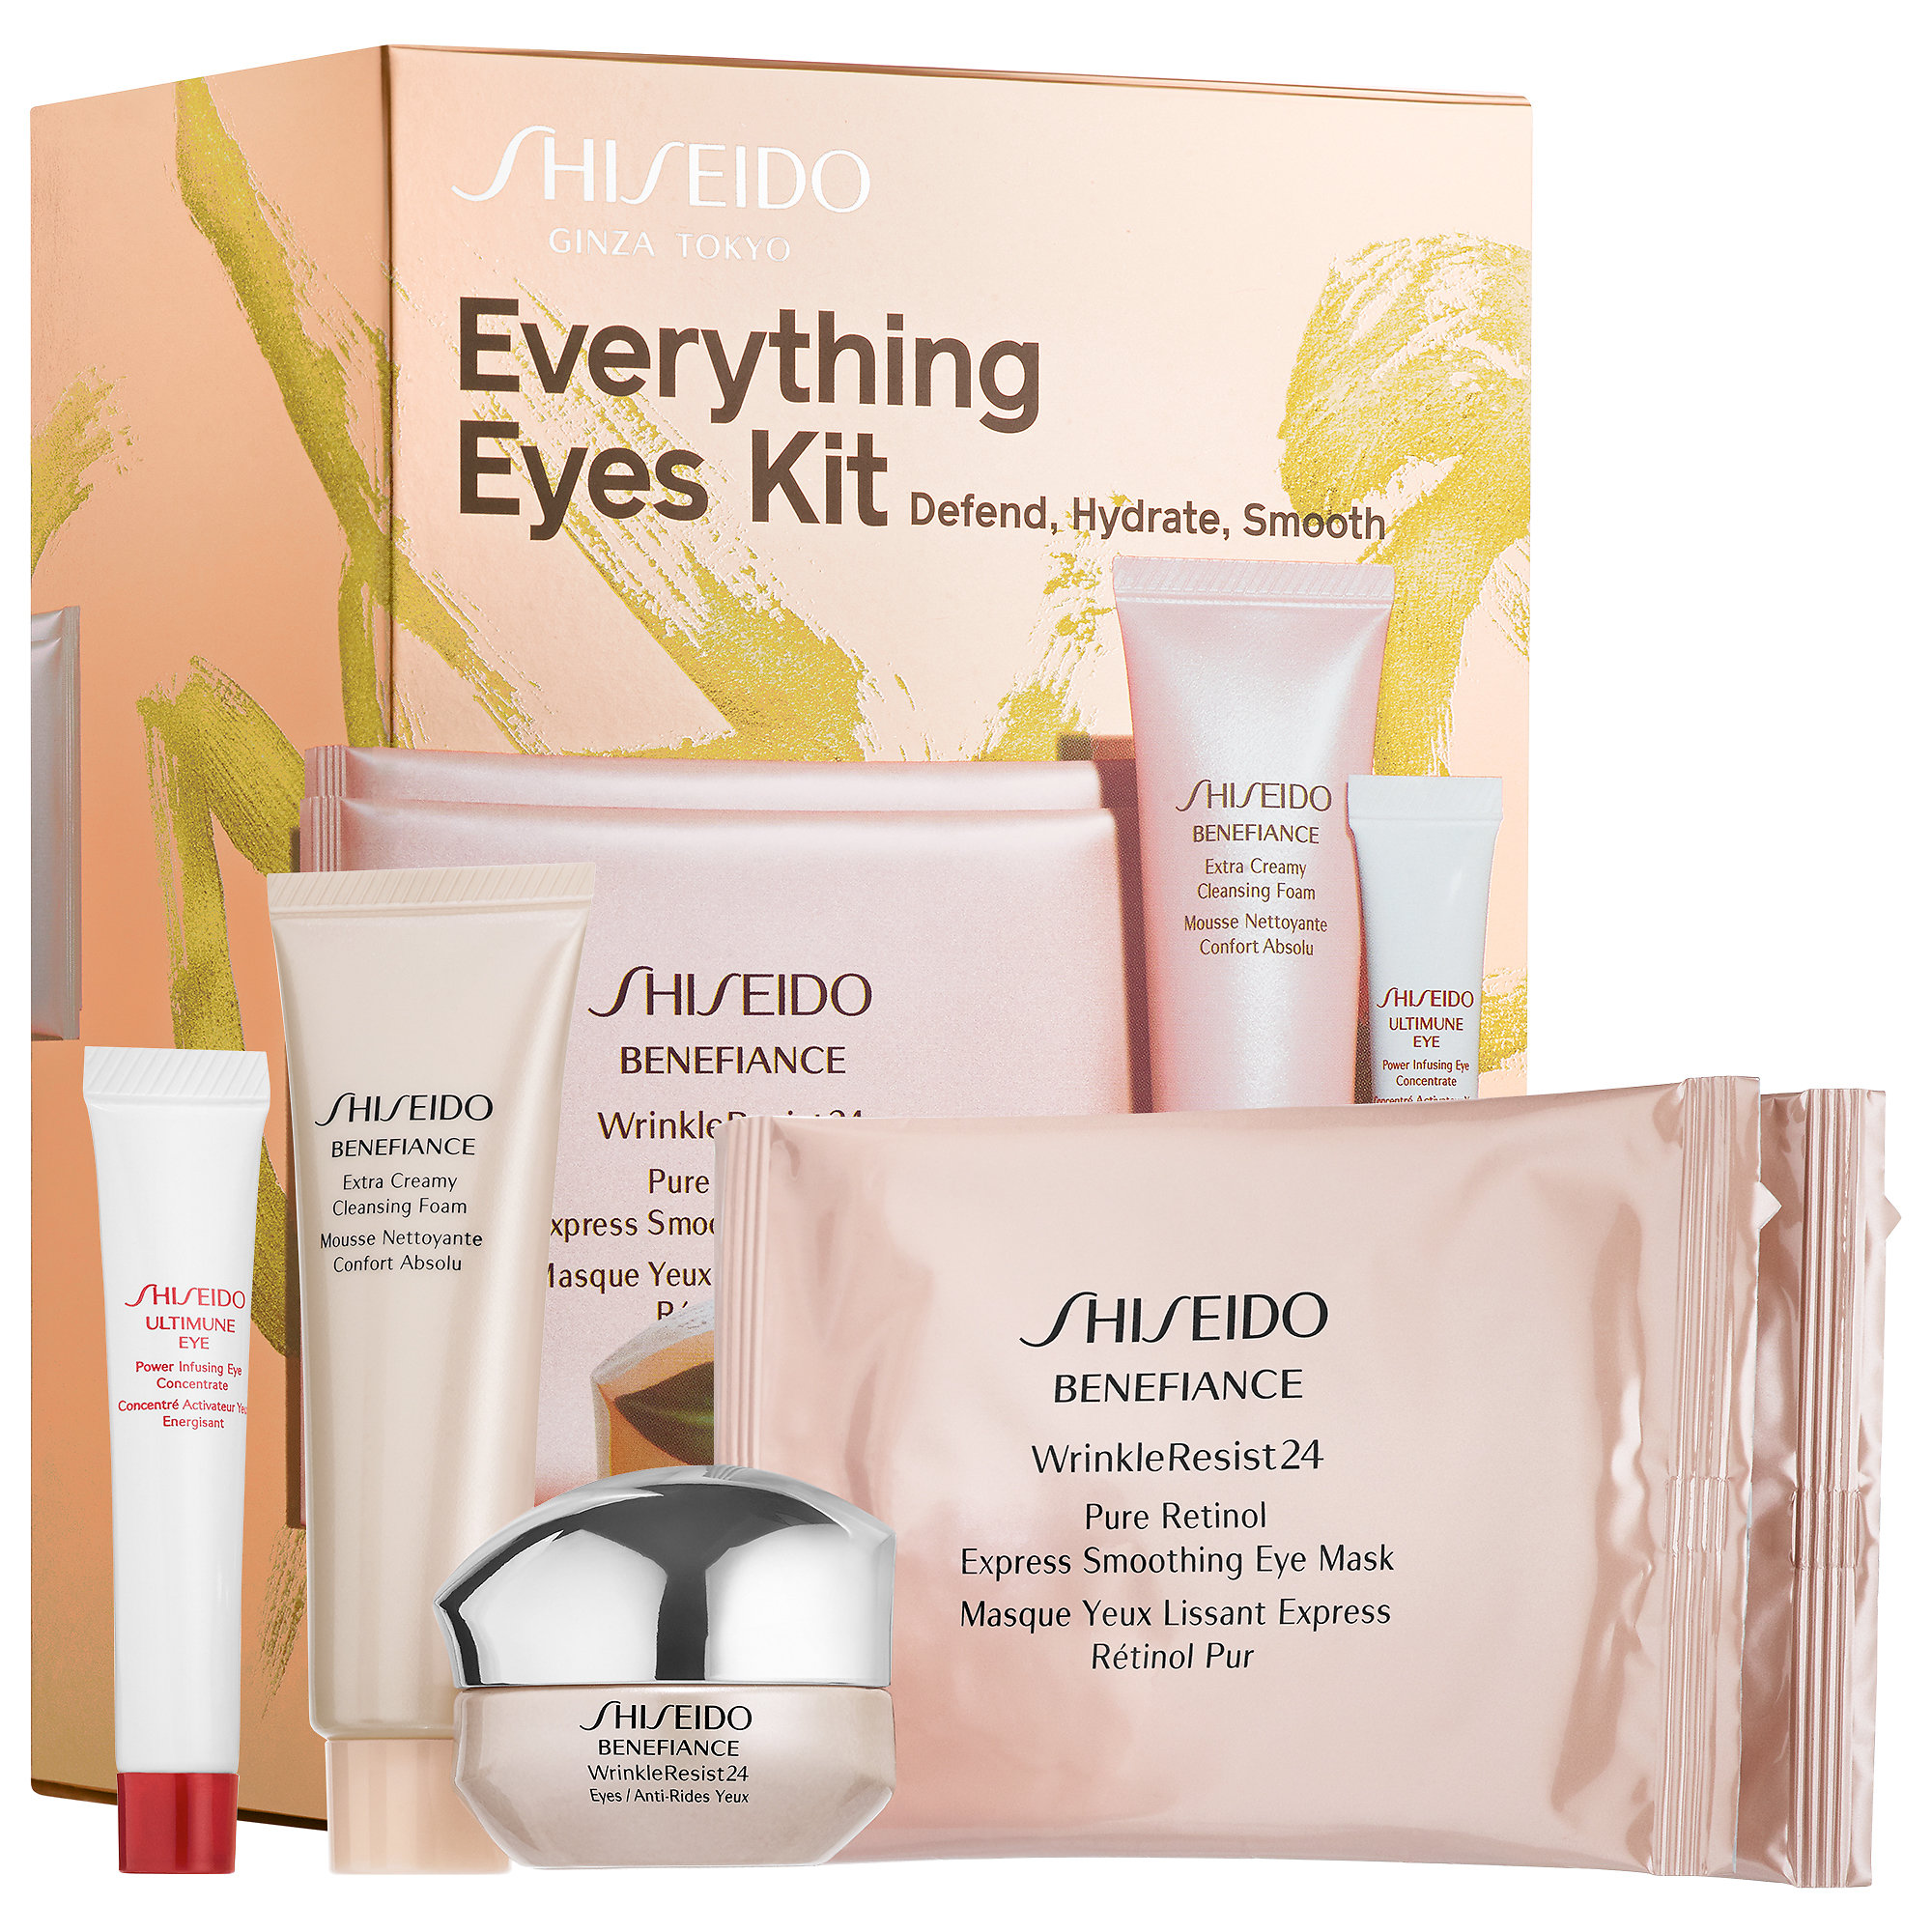 Shiseido Everything Eyes Kit Gift Set Sephora.jpg